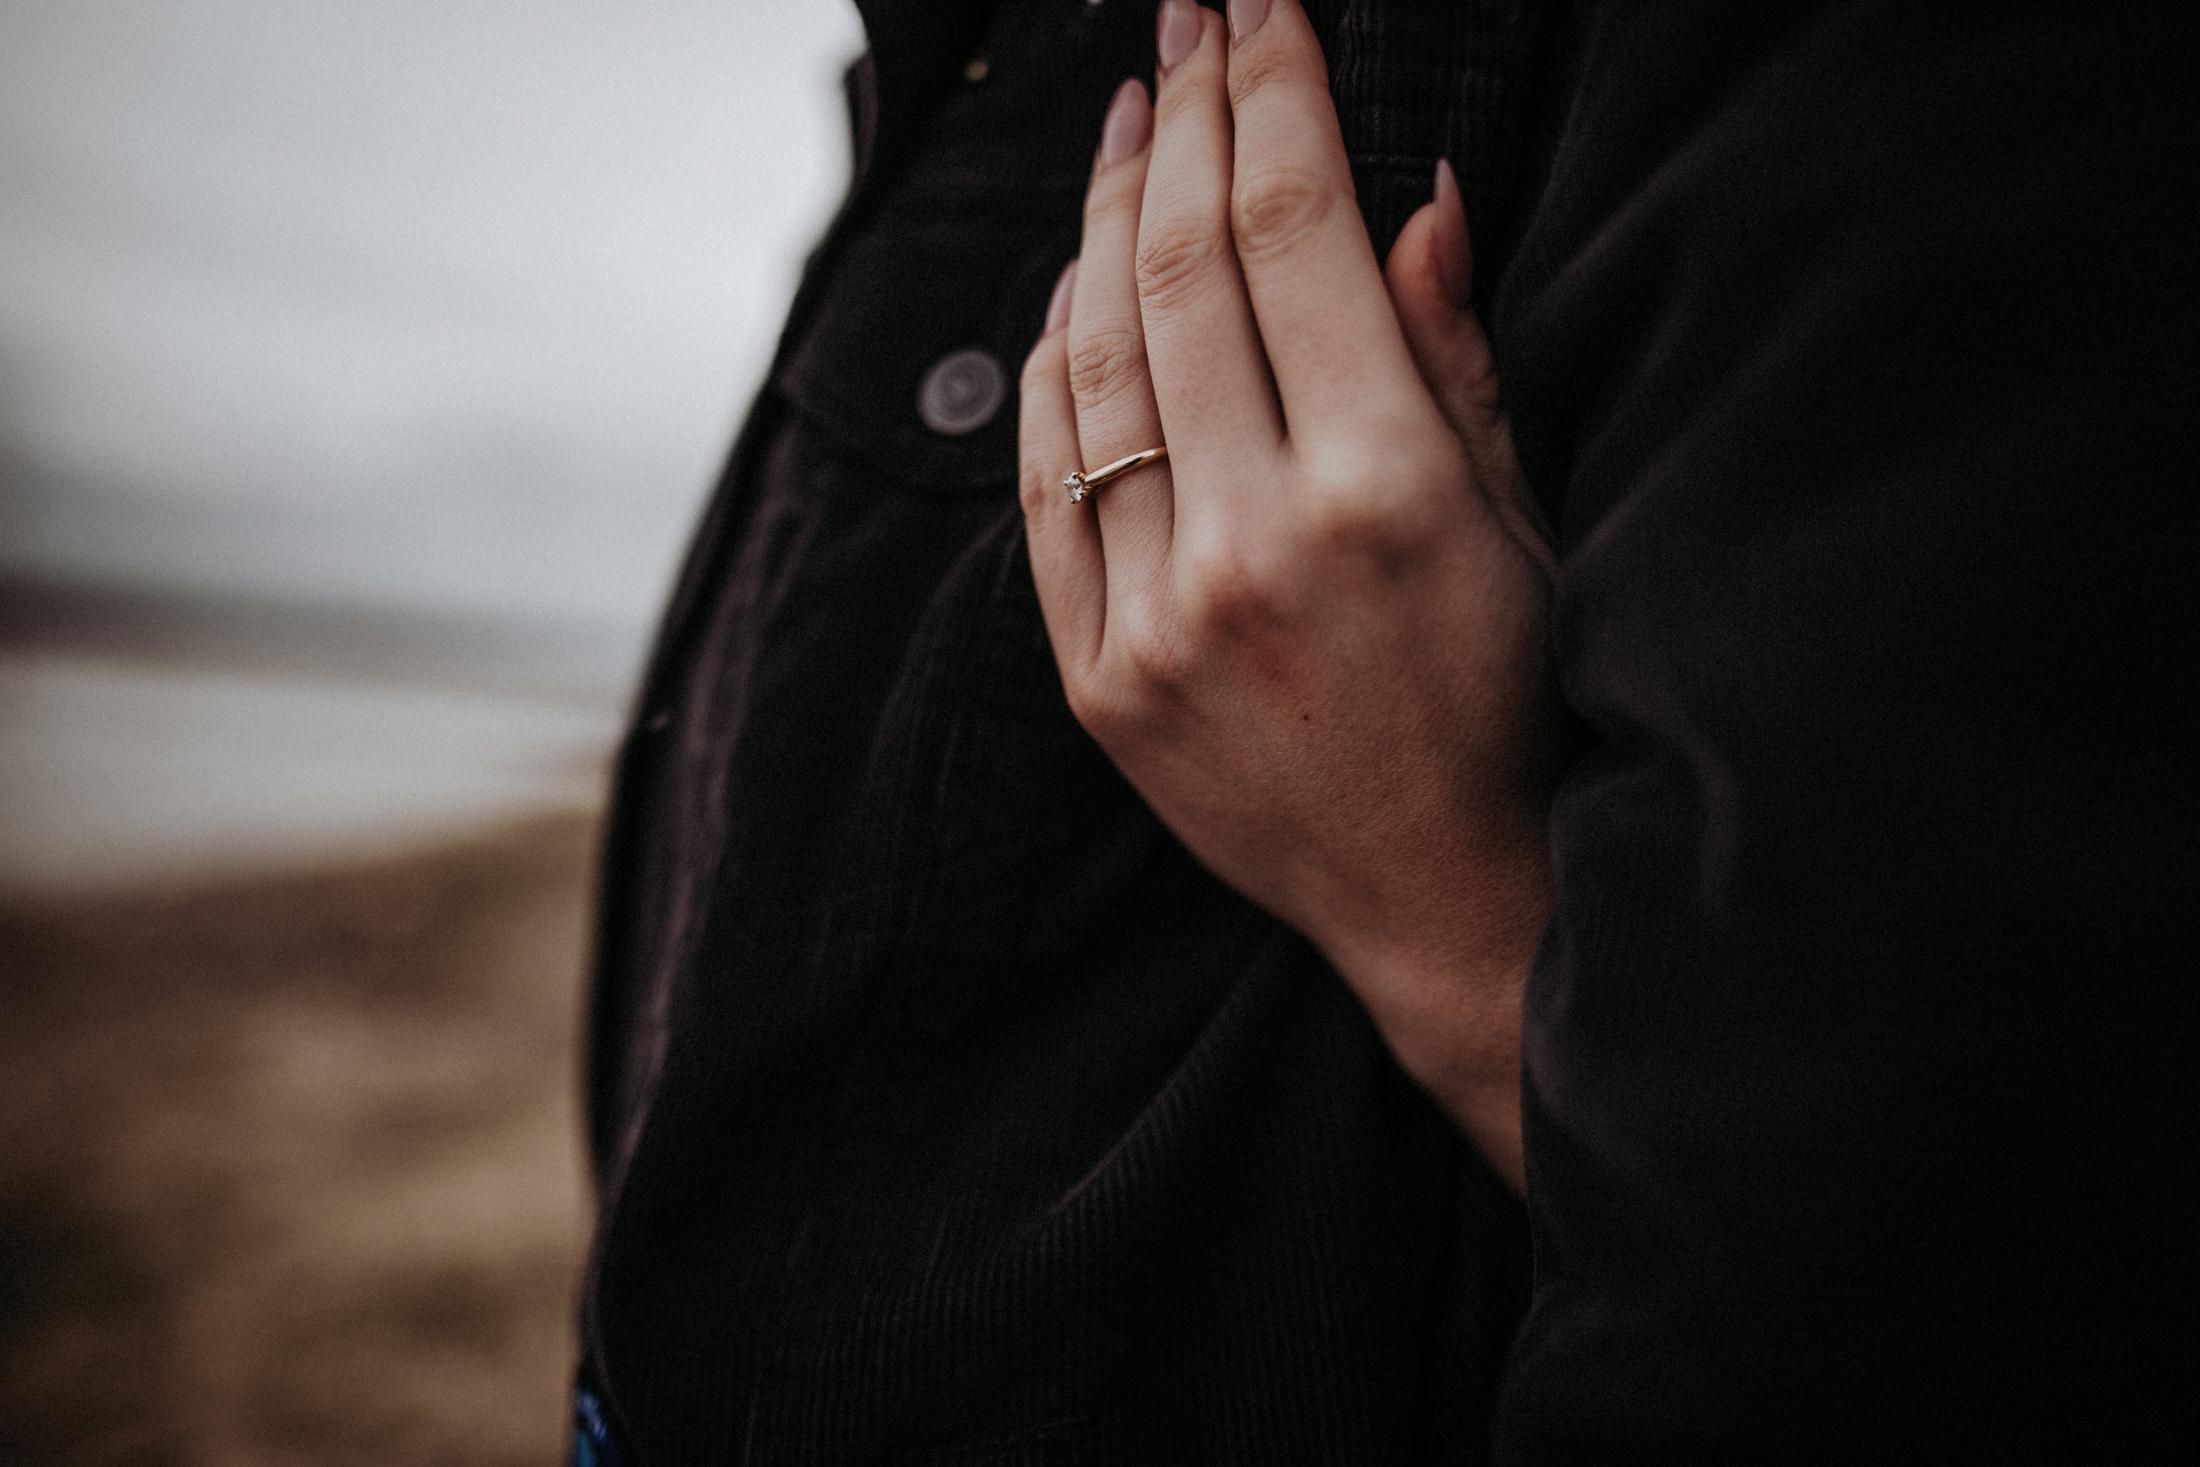 Wedding_Photographer_Mallorca_DanielaMarquardt_Photography_CanaryIslands_Lanzarote_Iceland_Tuscany_Santorini_Portugal_NewYork_Spain_Elopement_Hochzeitsfotograf_CK116